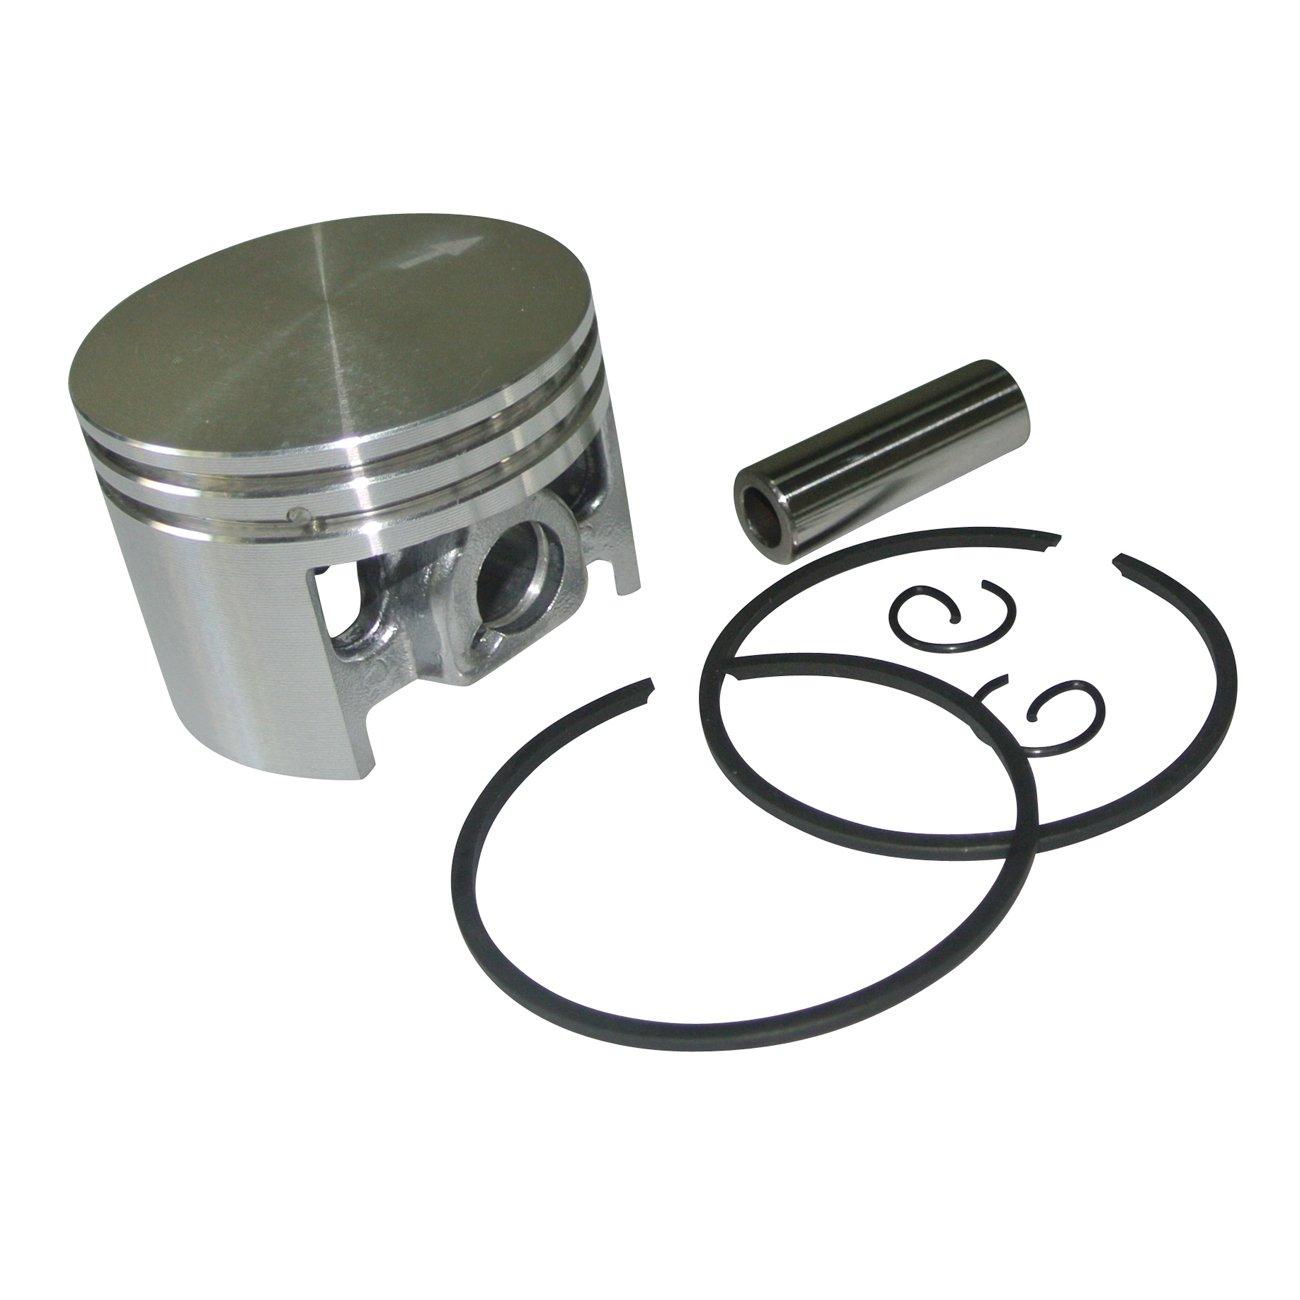 New 44mm Piston Ring & Piston Pin Kit For Stihl 026 MS260 MS260 Pro Chiansaw OEM# 1121 030 2001 JL JIANGLI LEGEND